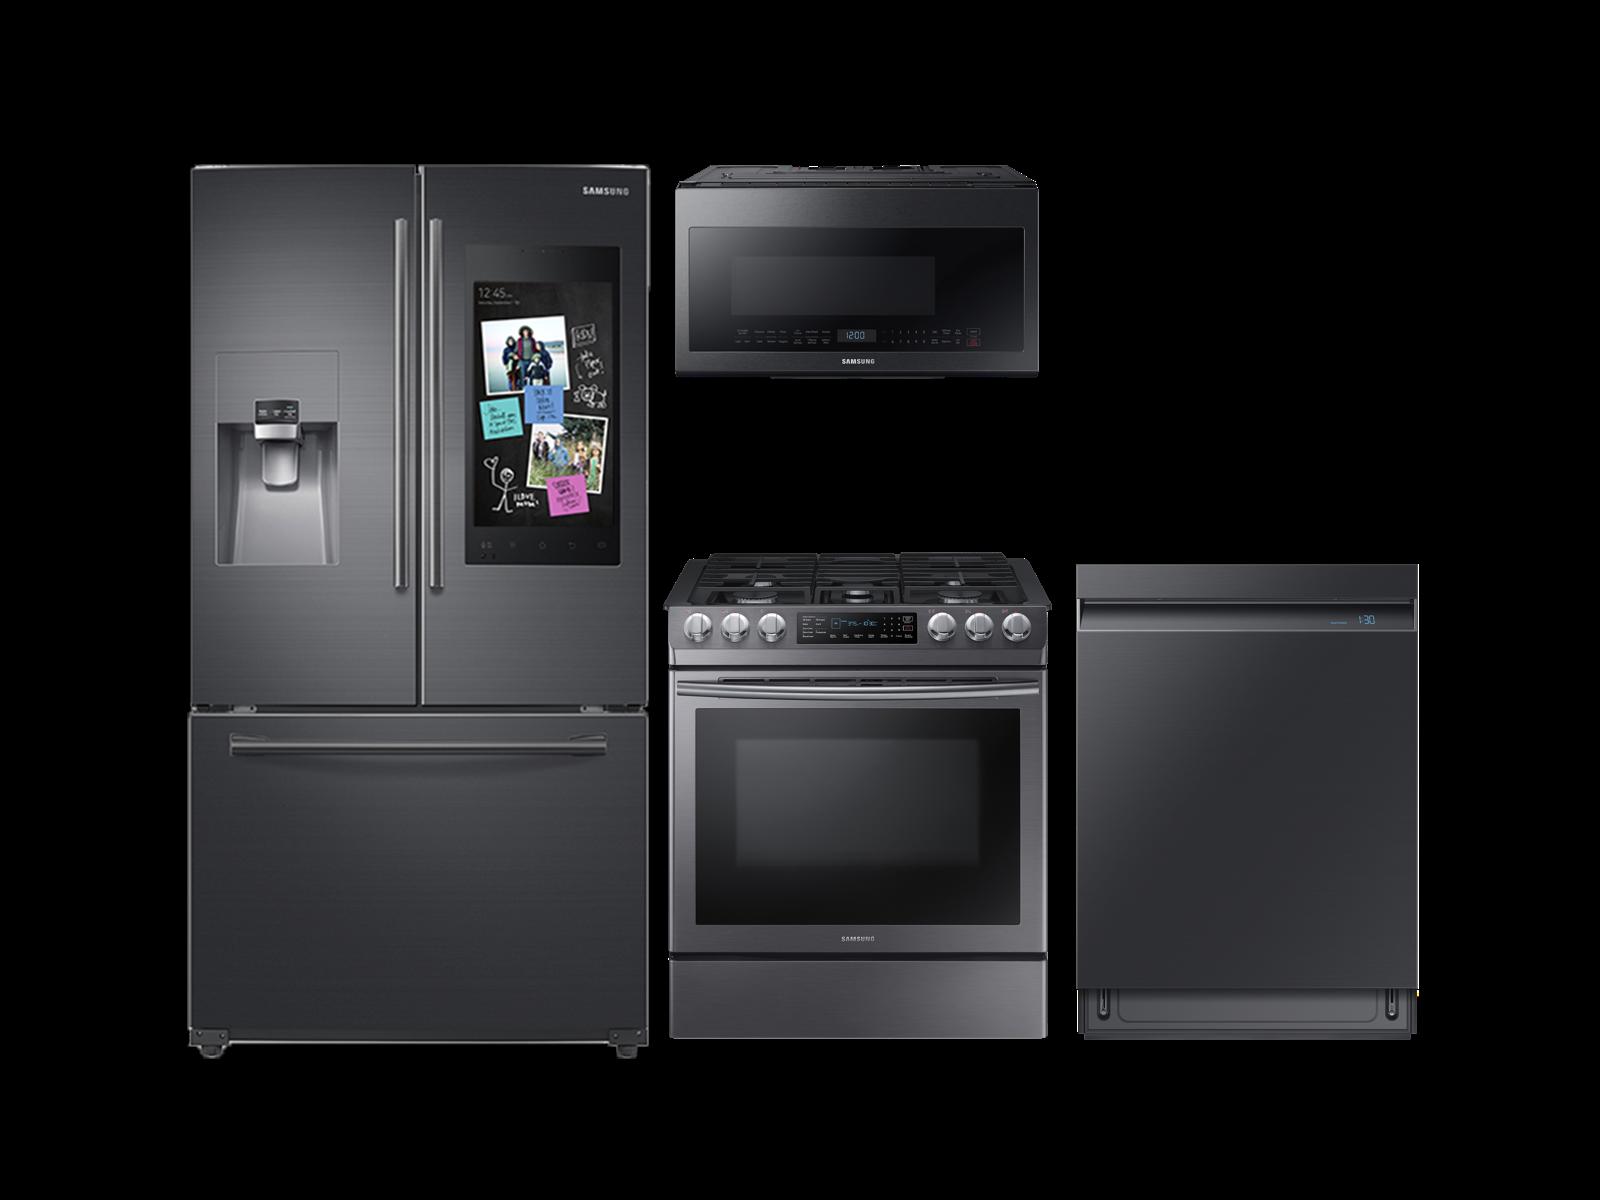 Samsung 3-door Family Hub Refrigerator + Slide-In Gas Range + Linear Wash Dishwasher + Microwave Kitchen Package in Black Stainless